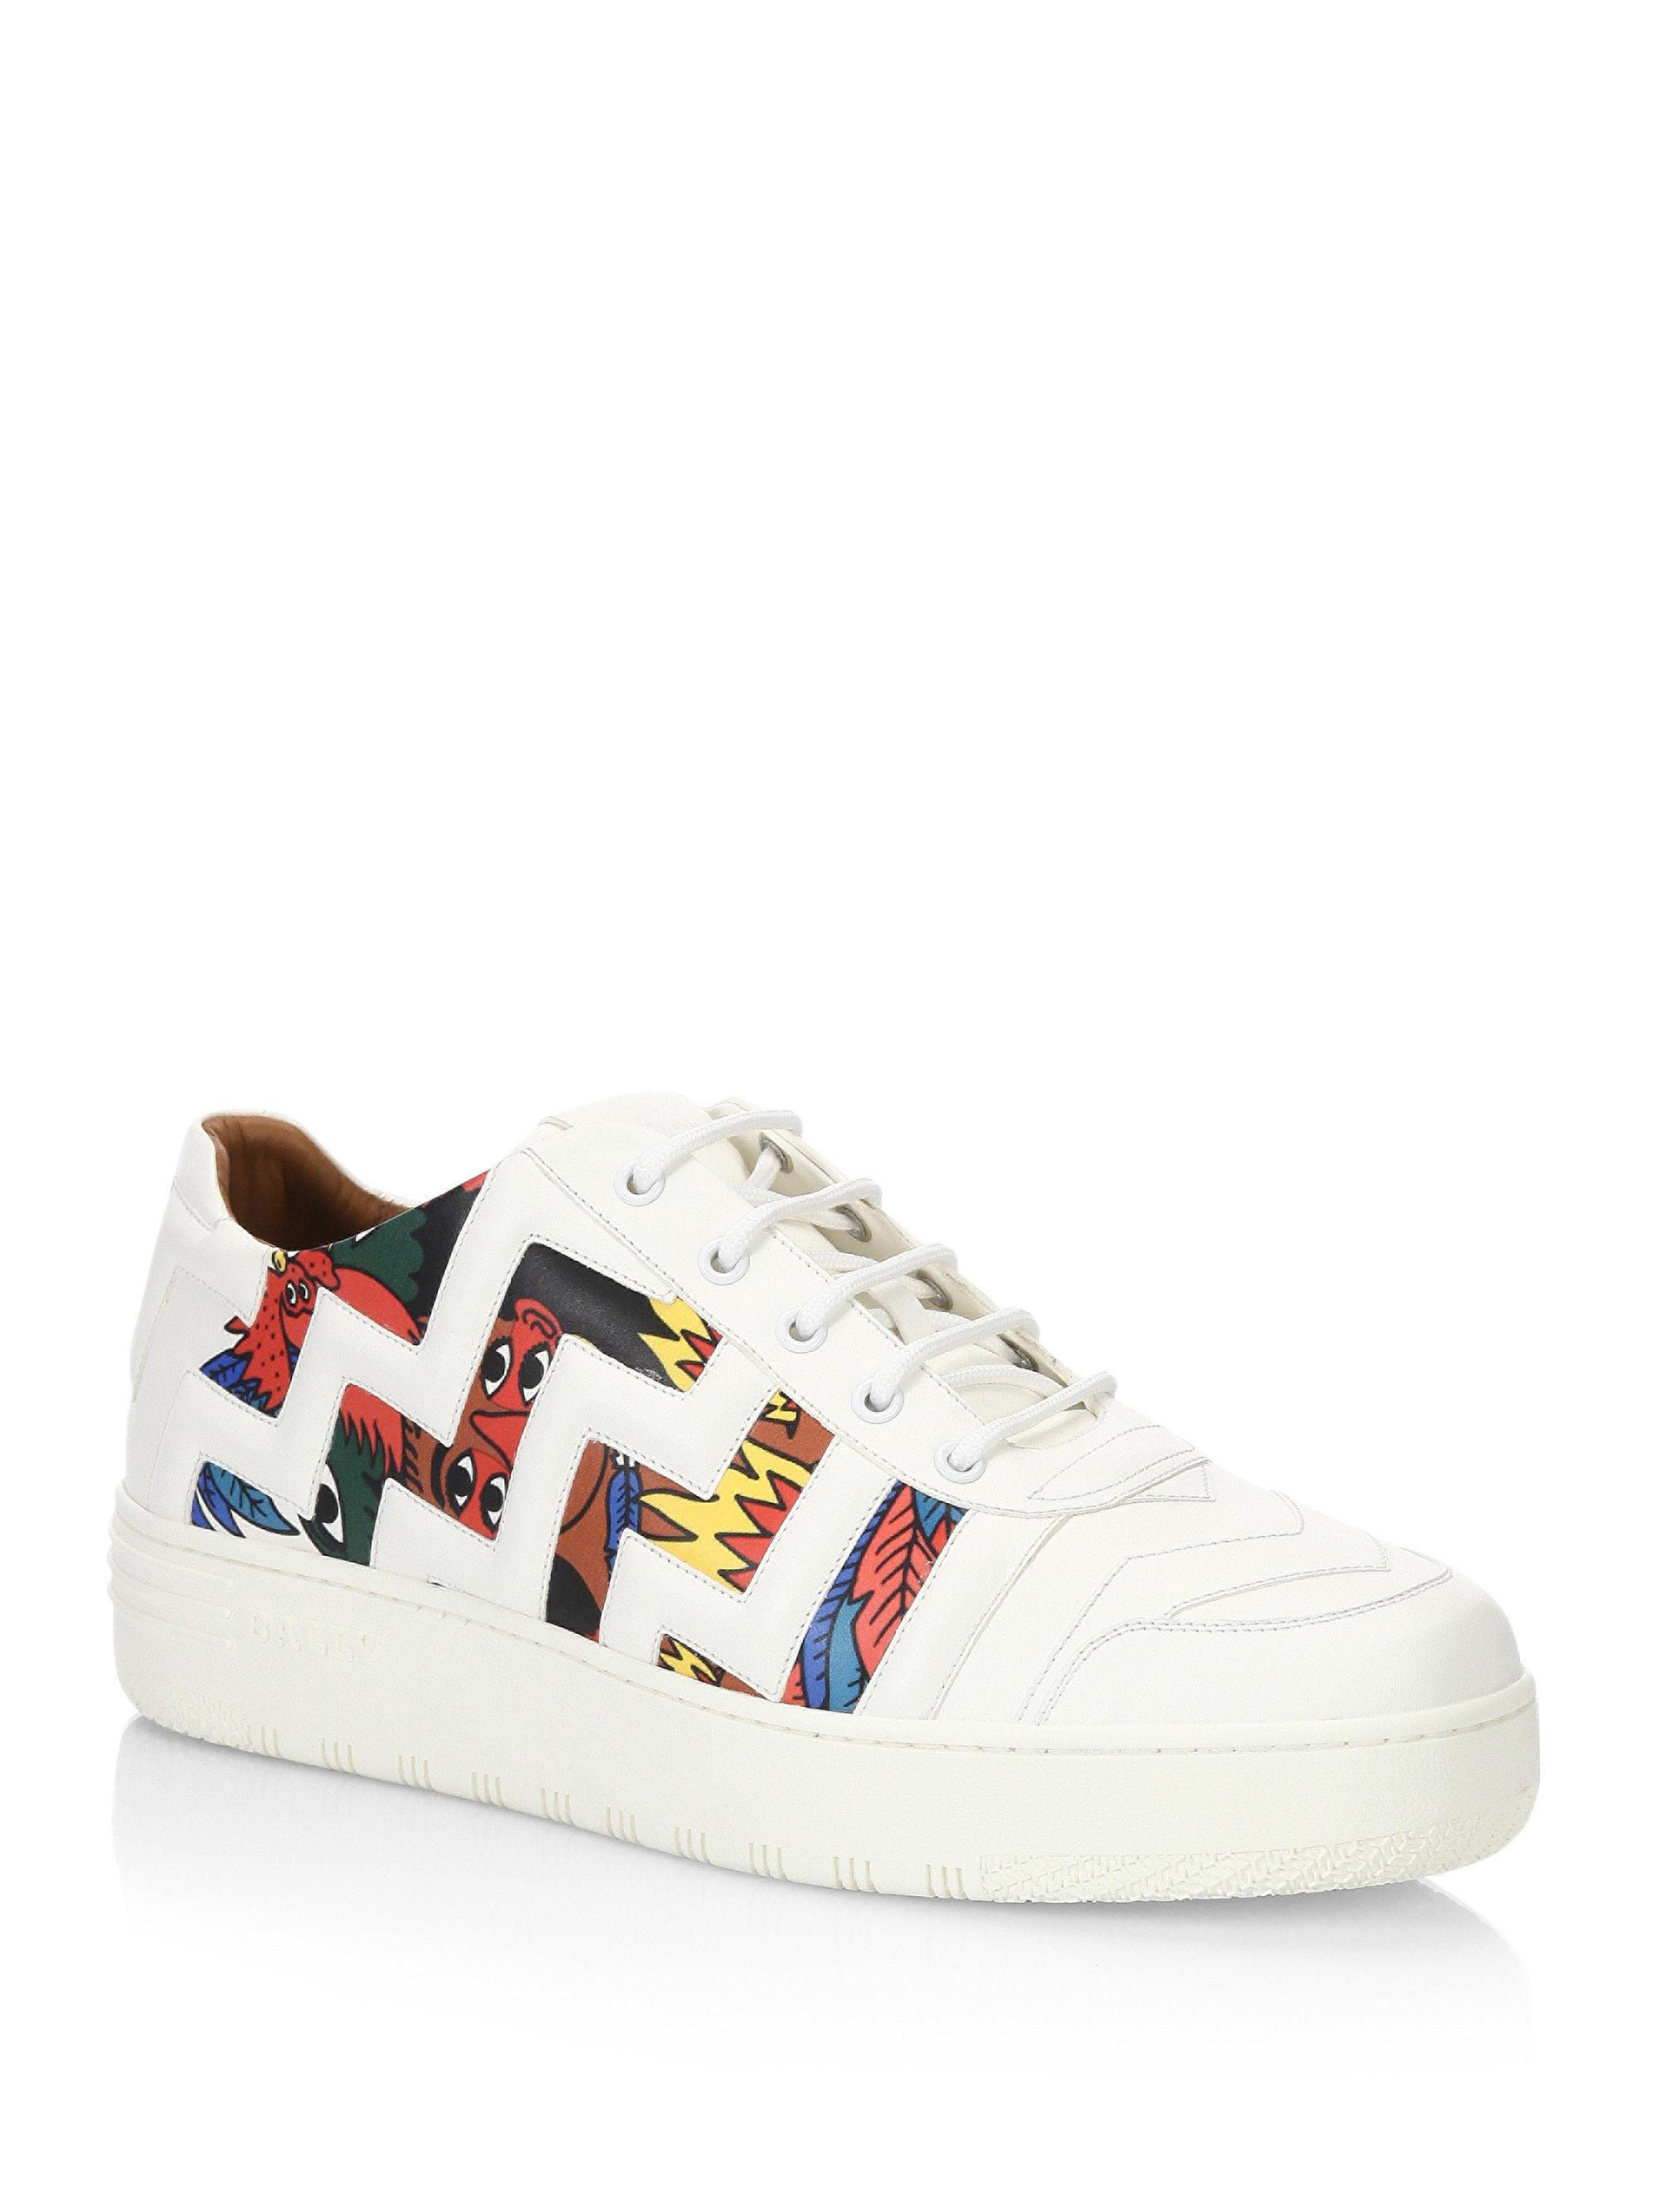 3ad21b4bd95 Lyst - Bally X Swizz Beatz Leather Sneakers in White